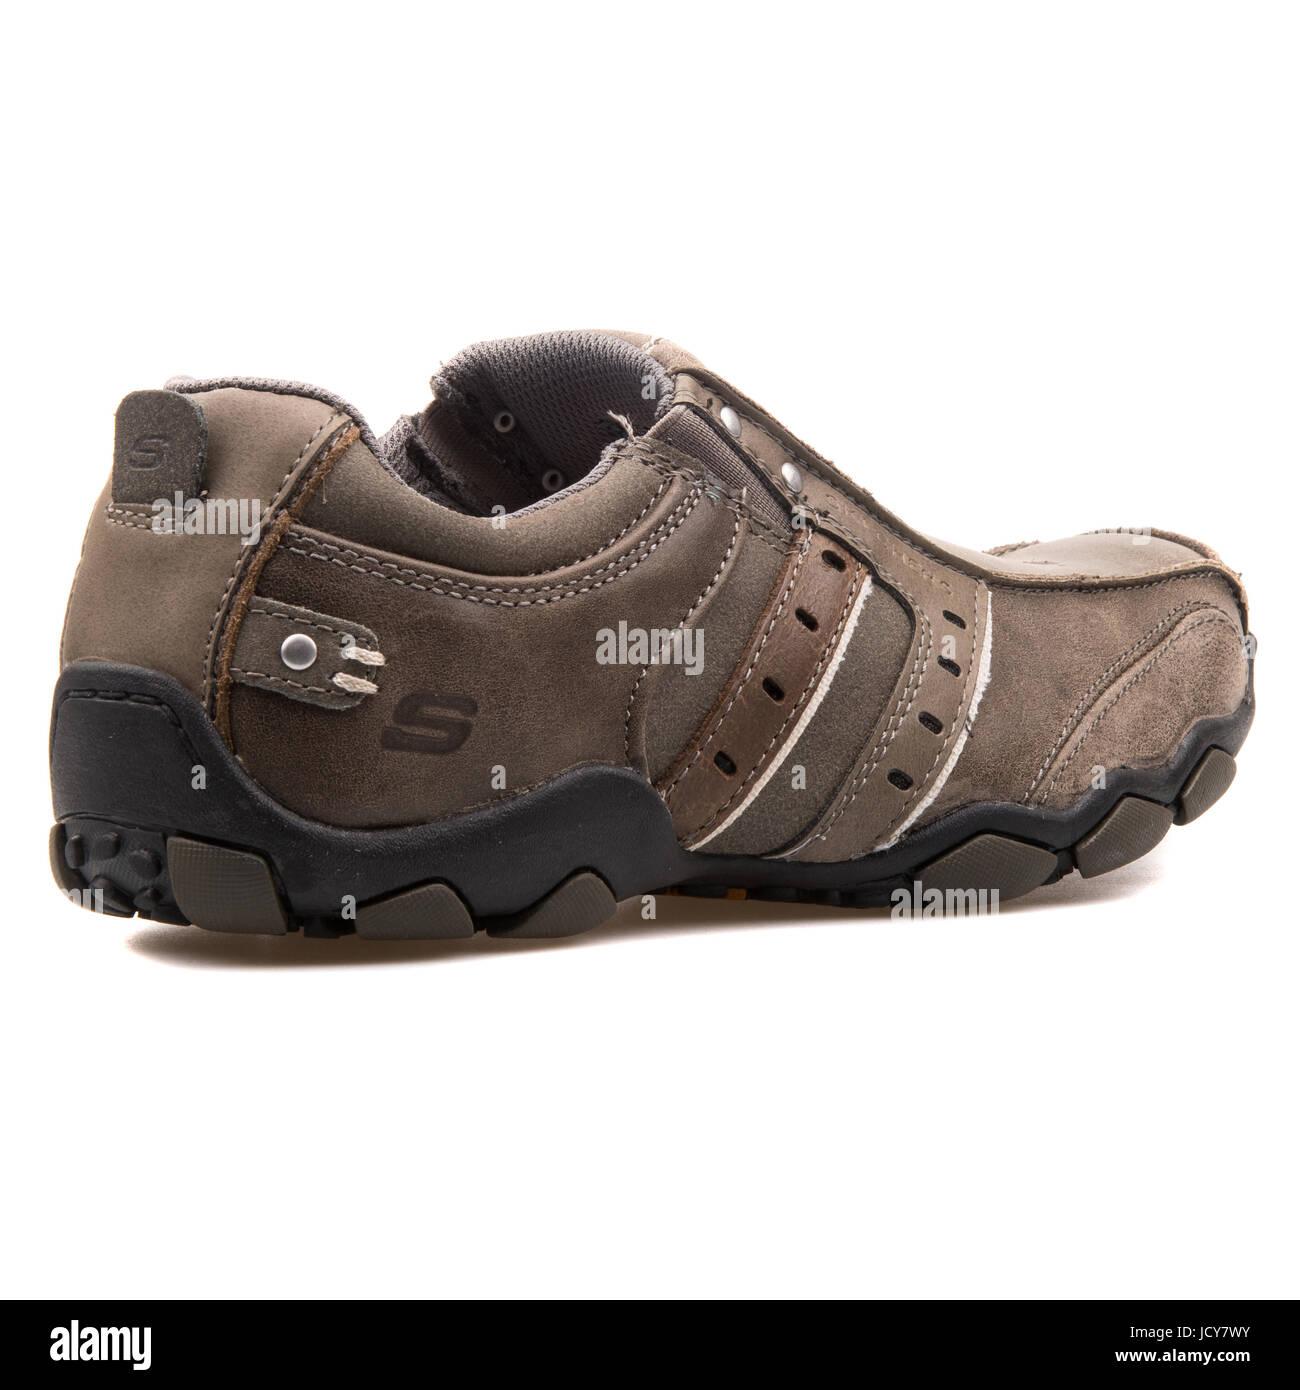 533e3f59b33b Skechers Diameter Charcoal Men s Leather Sports Shoes - 61779-CHAR ...